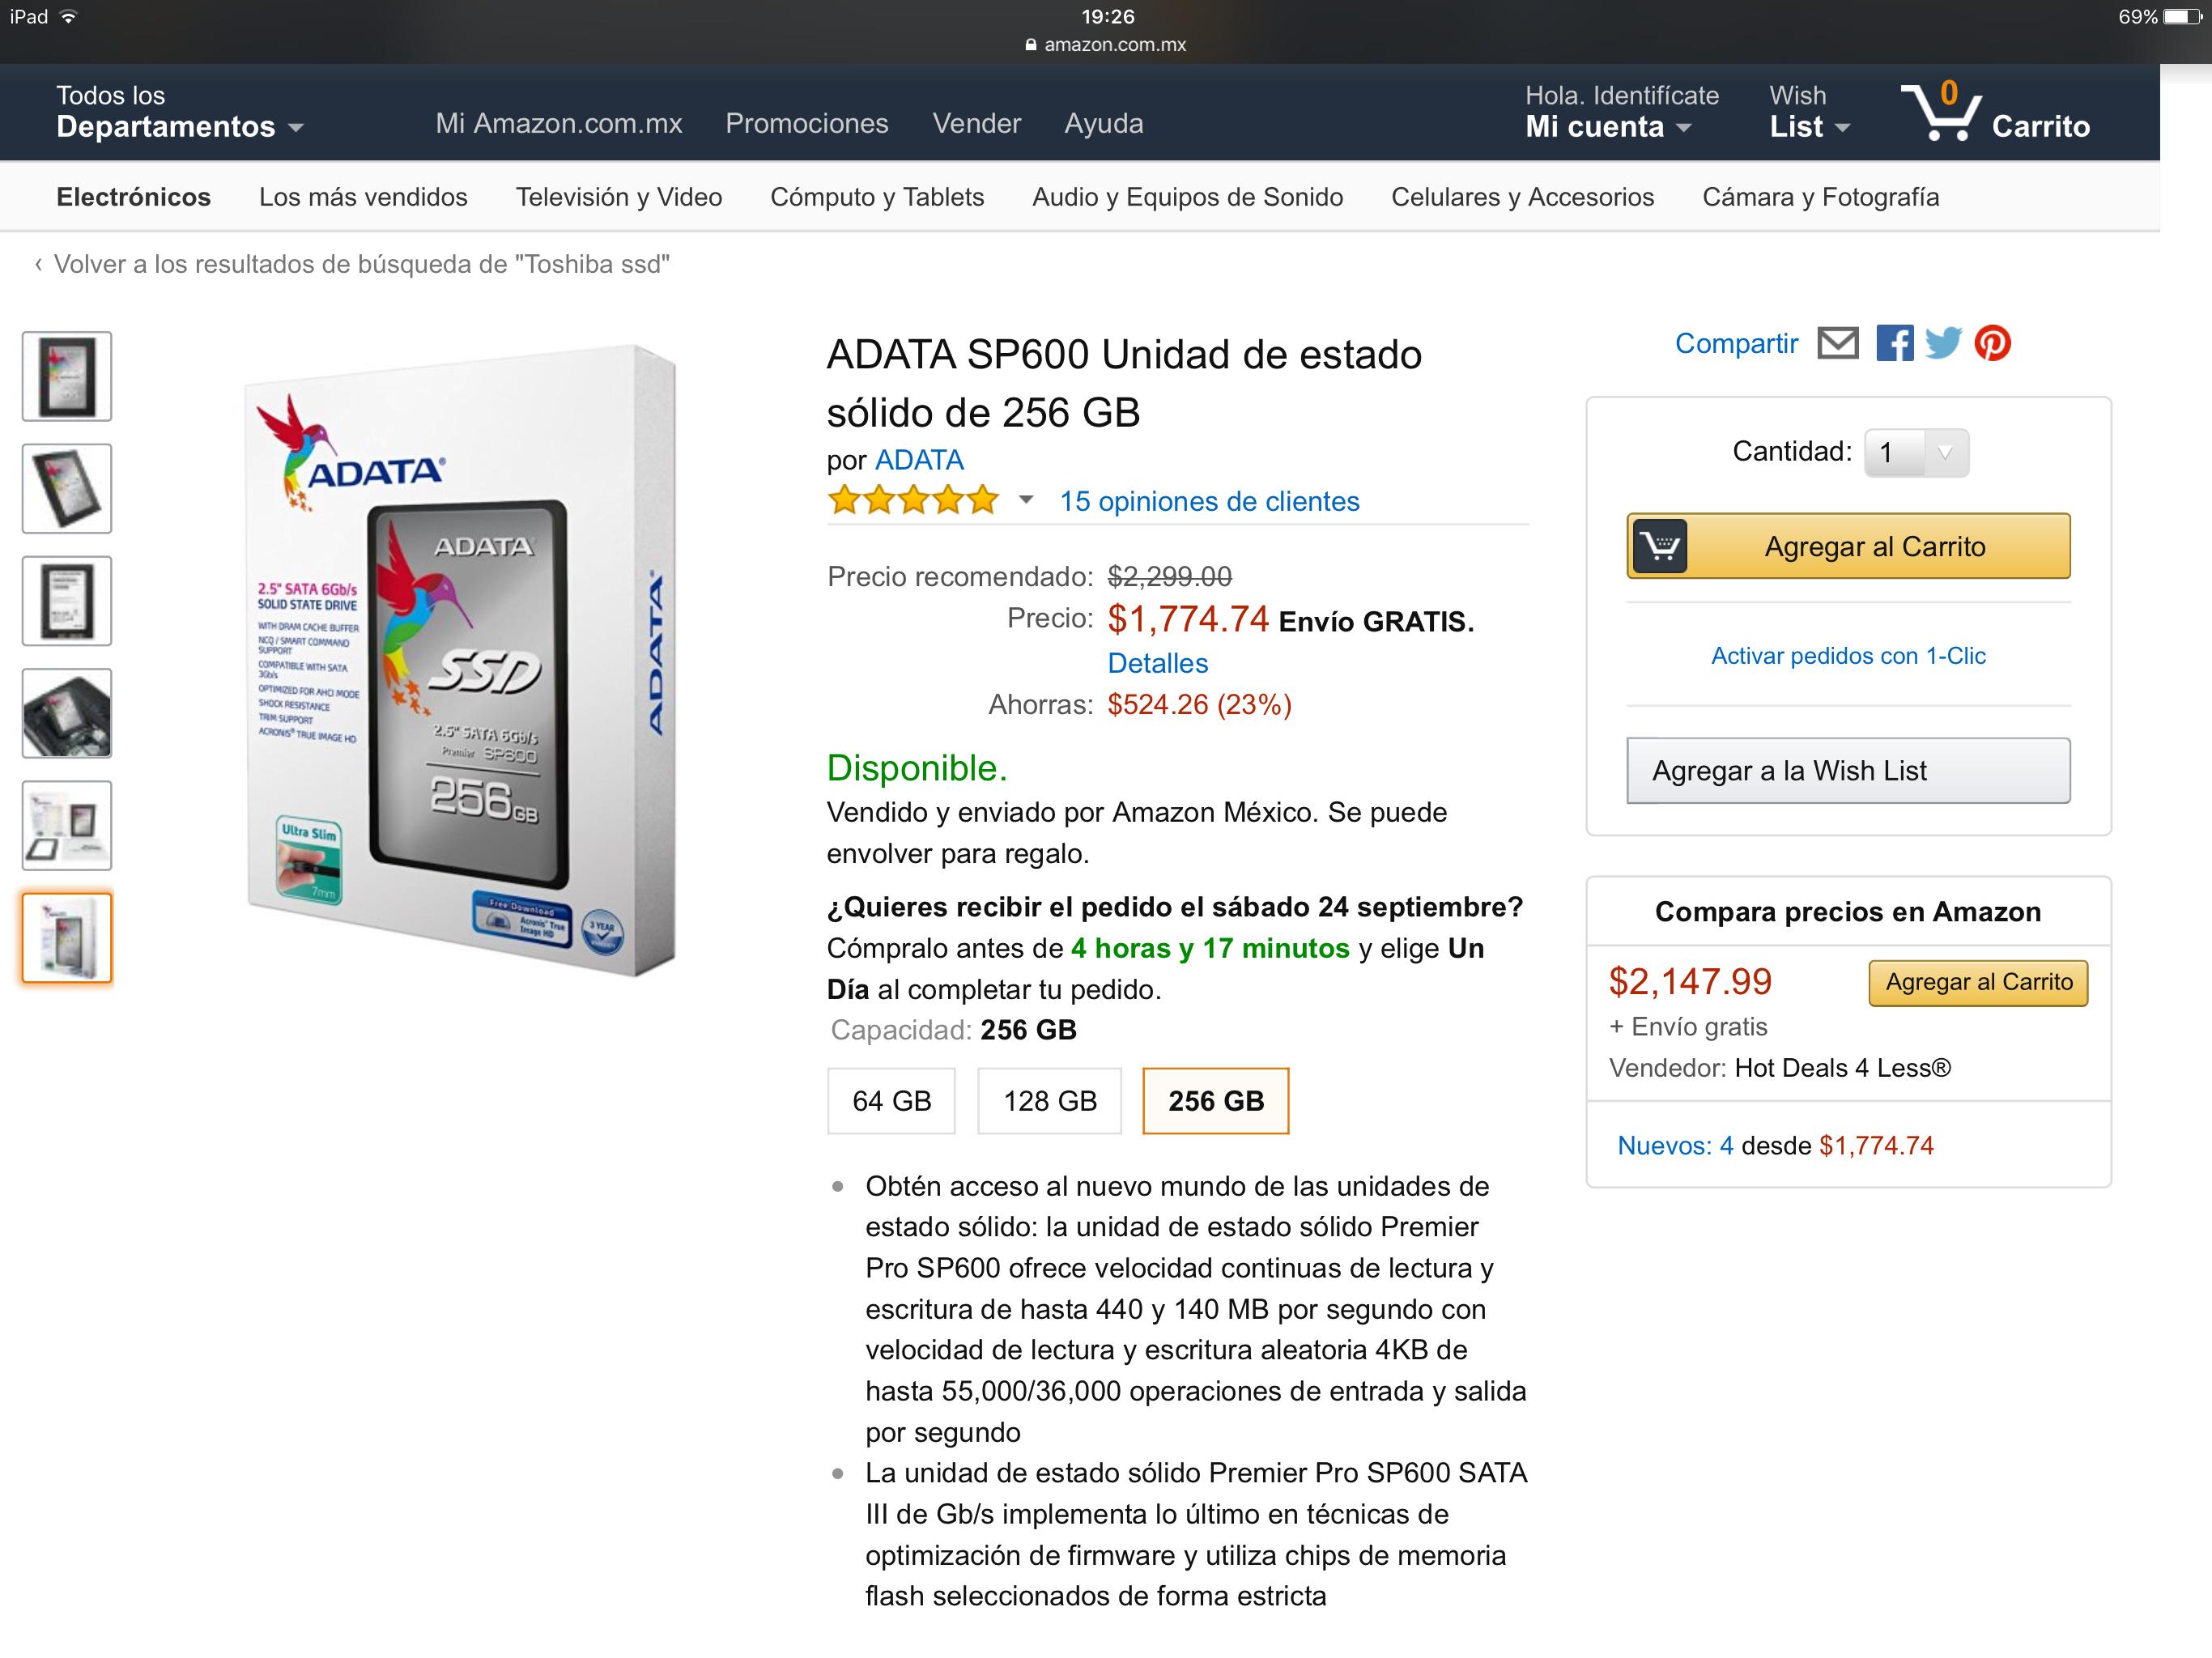 AMAZON MX: SSD ADATA 256 GB $1,597.26 con Banamex ($1,745 otros medios)